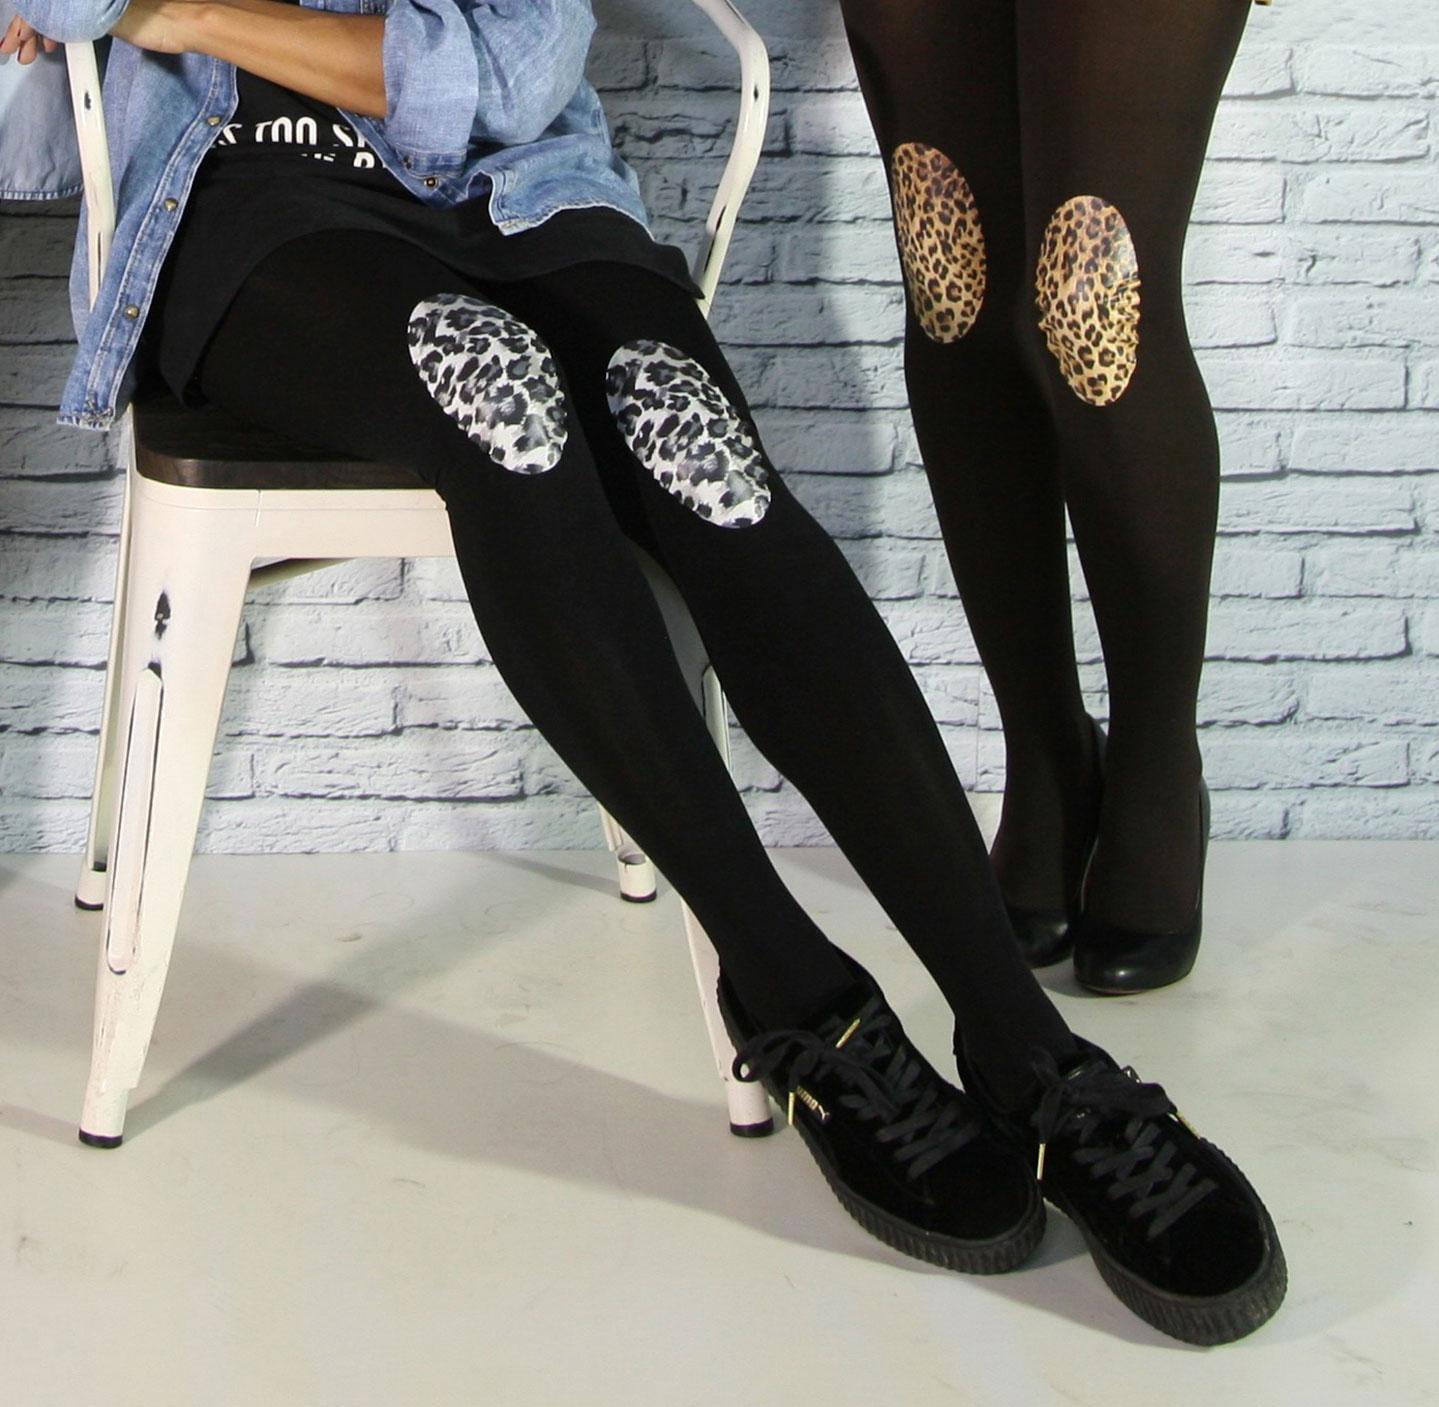 Legs Go Shop